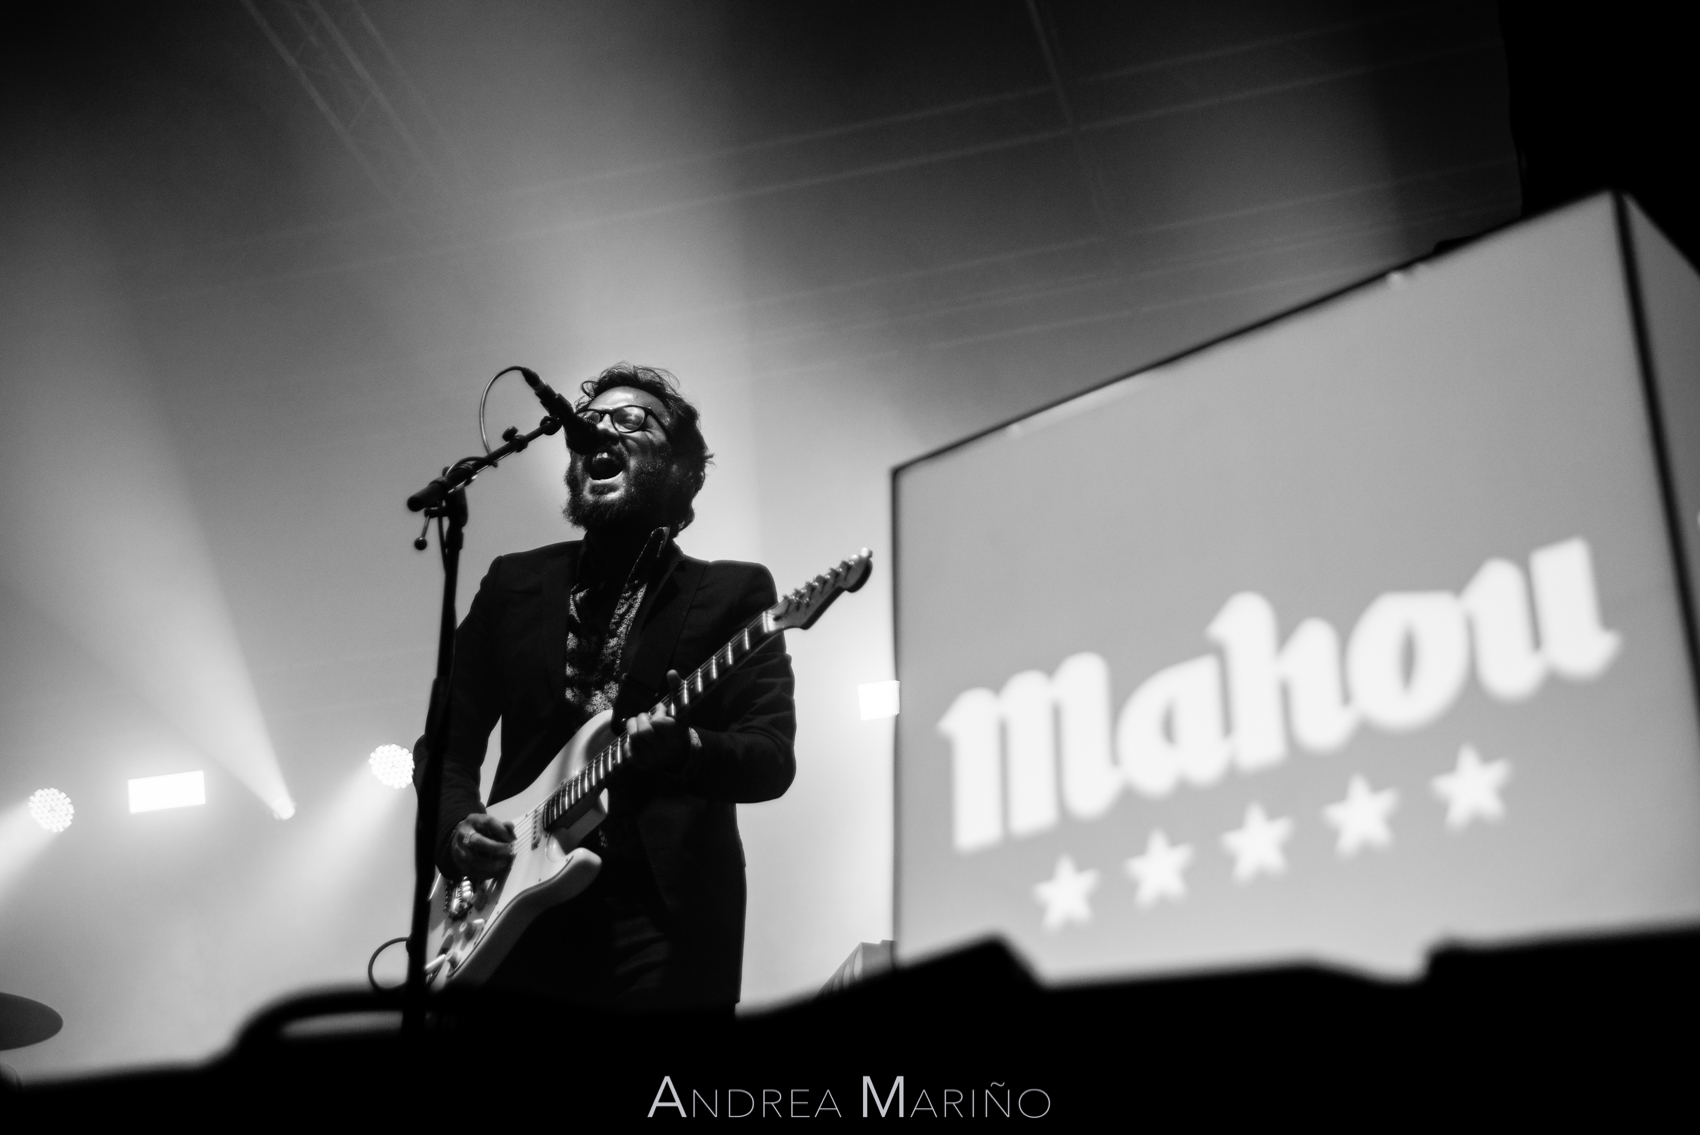 Andrea Mariño. Sidonie. Vive Nigrán. Nigrán. 21/7/18